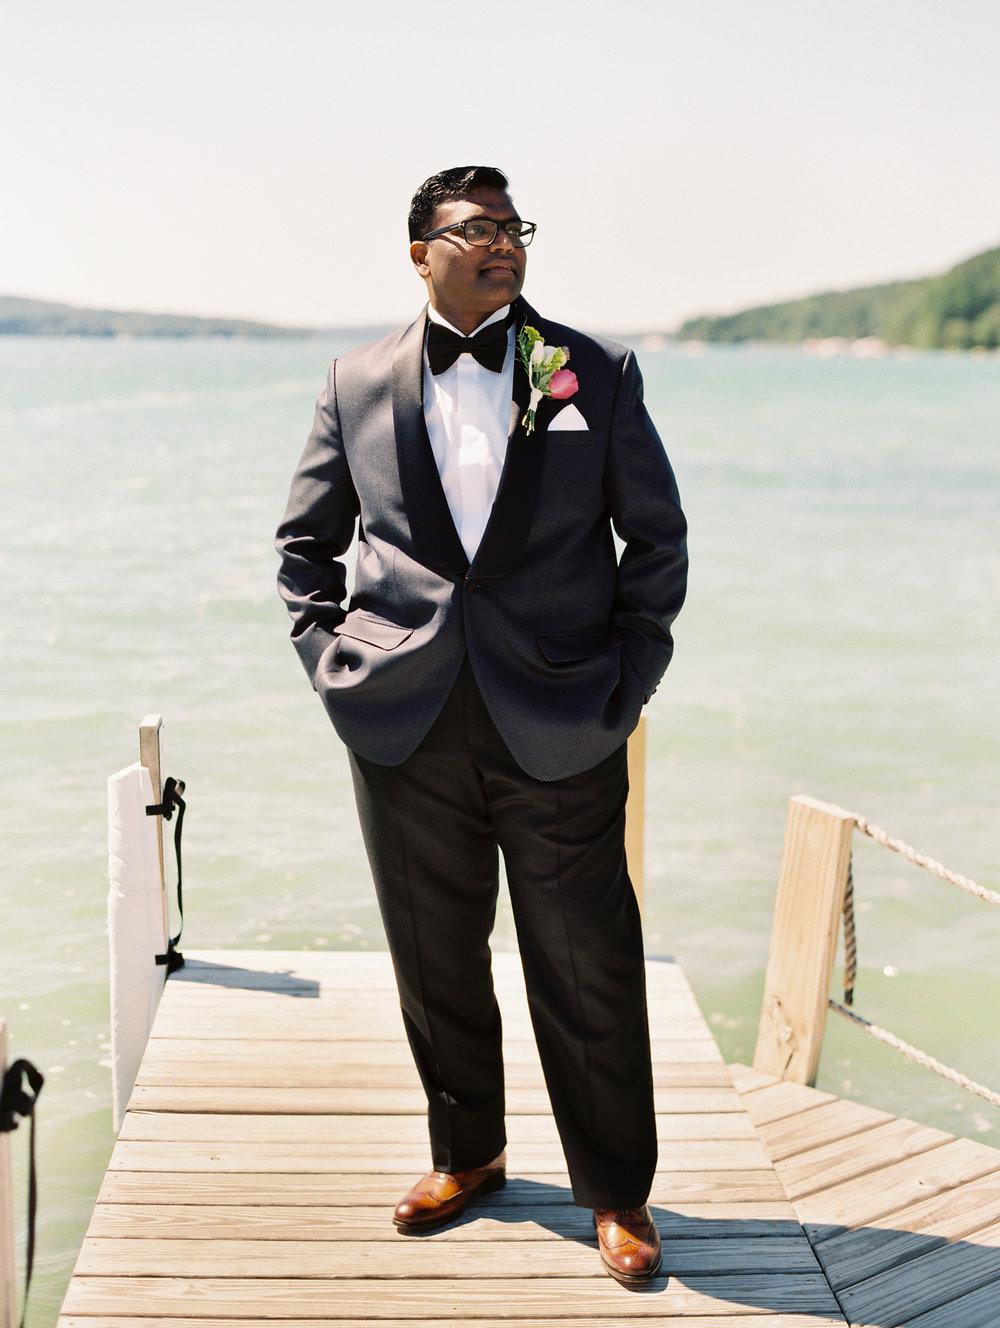 Govathoti+Wedding+First+Look-50.jpg